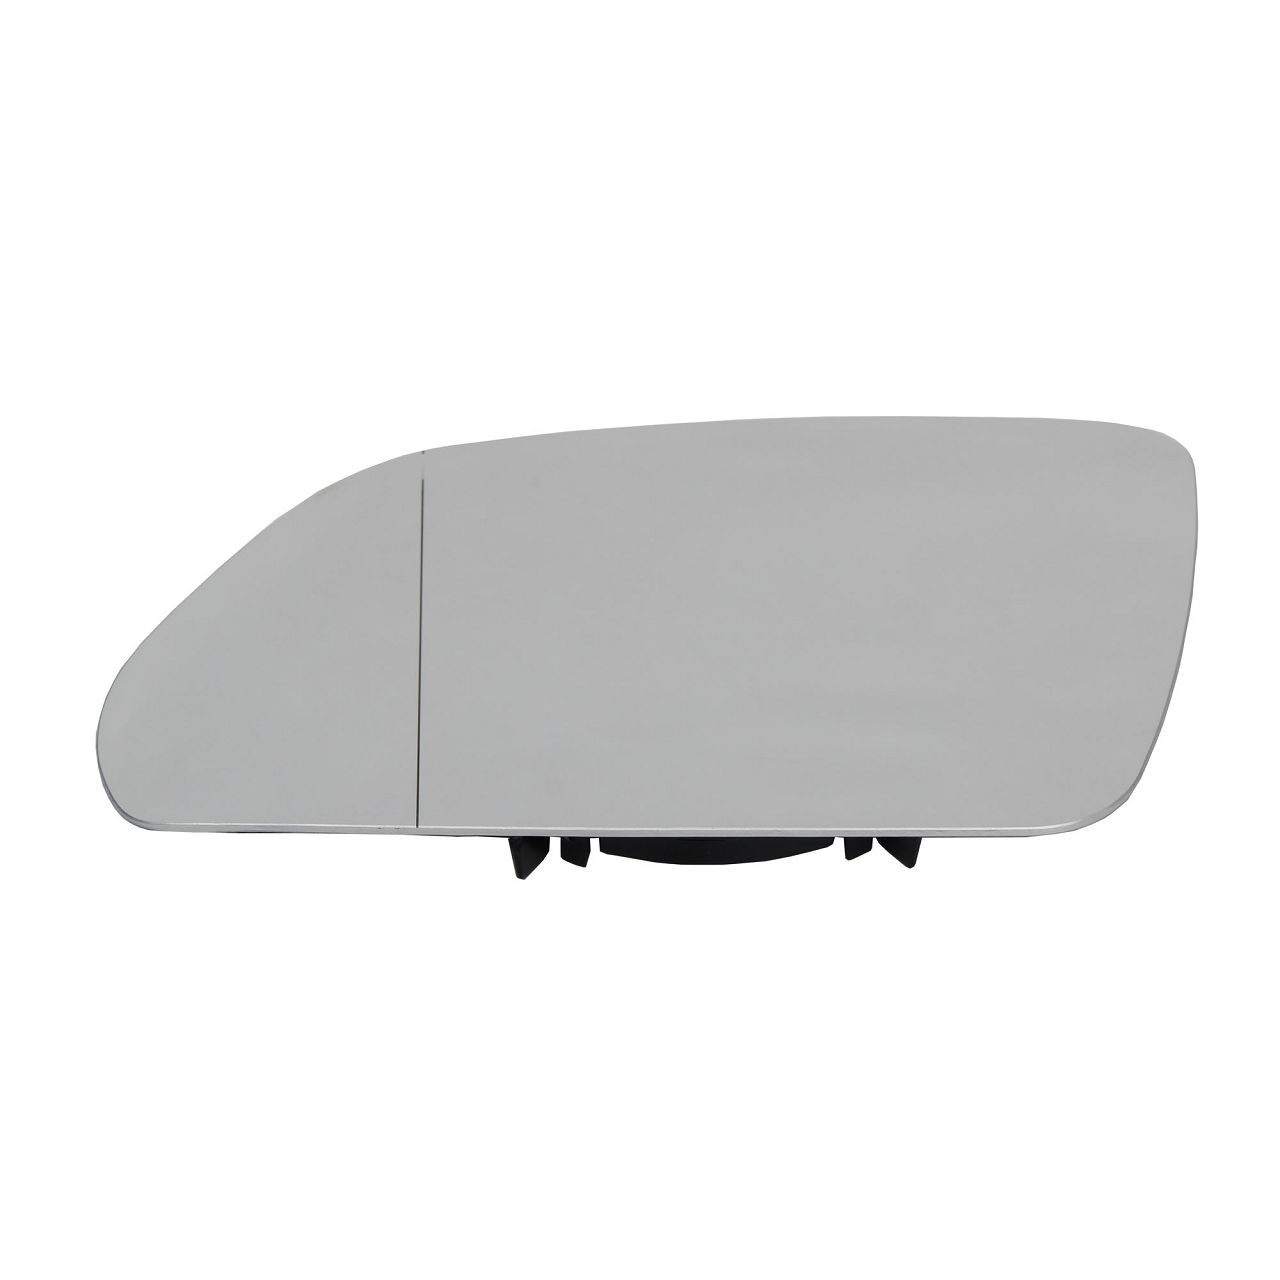 Außenspiegel Spiegelglas SKODA Octavia II VW Polo 9N links 6Q0857521F